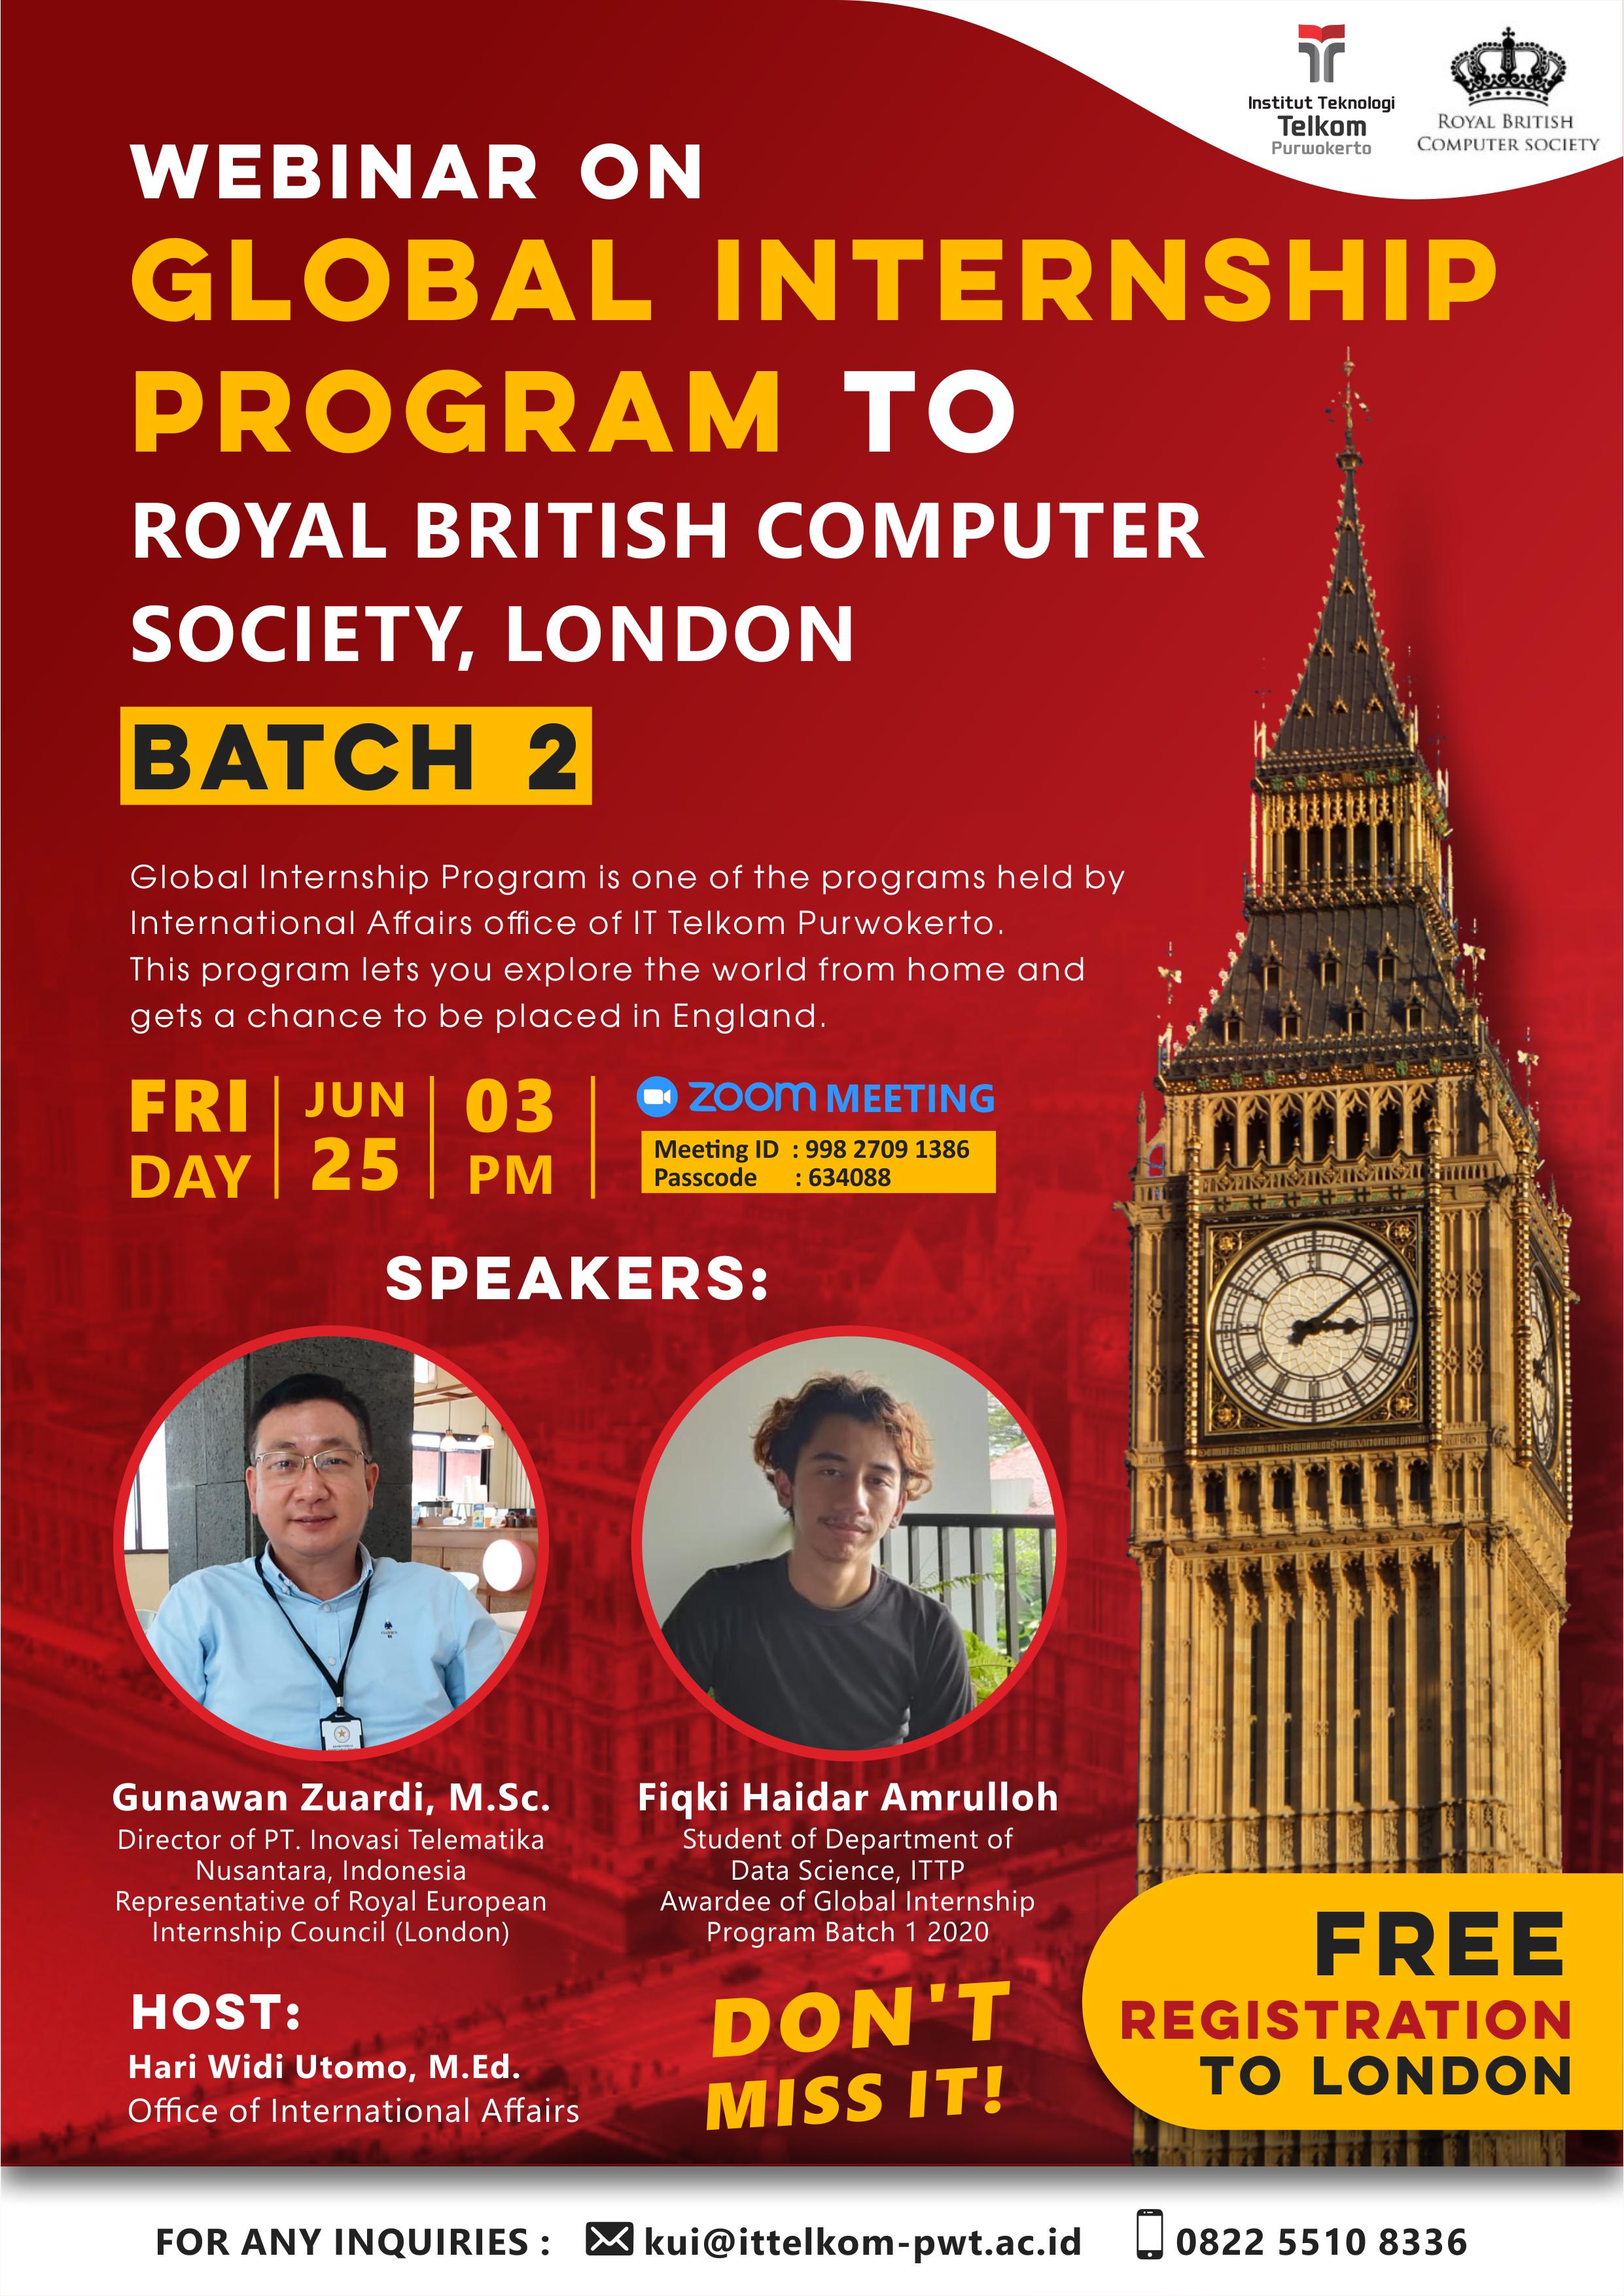 Webinar on Global Internship Program to Royal British Computer Society, London